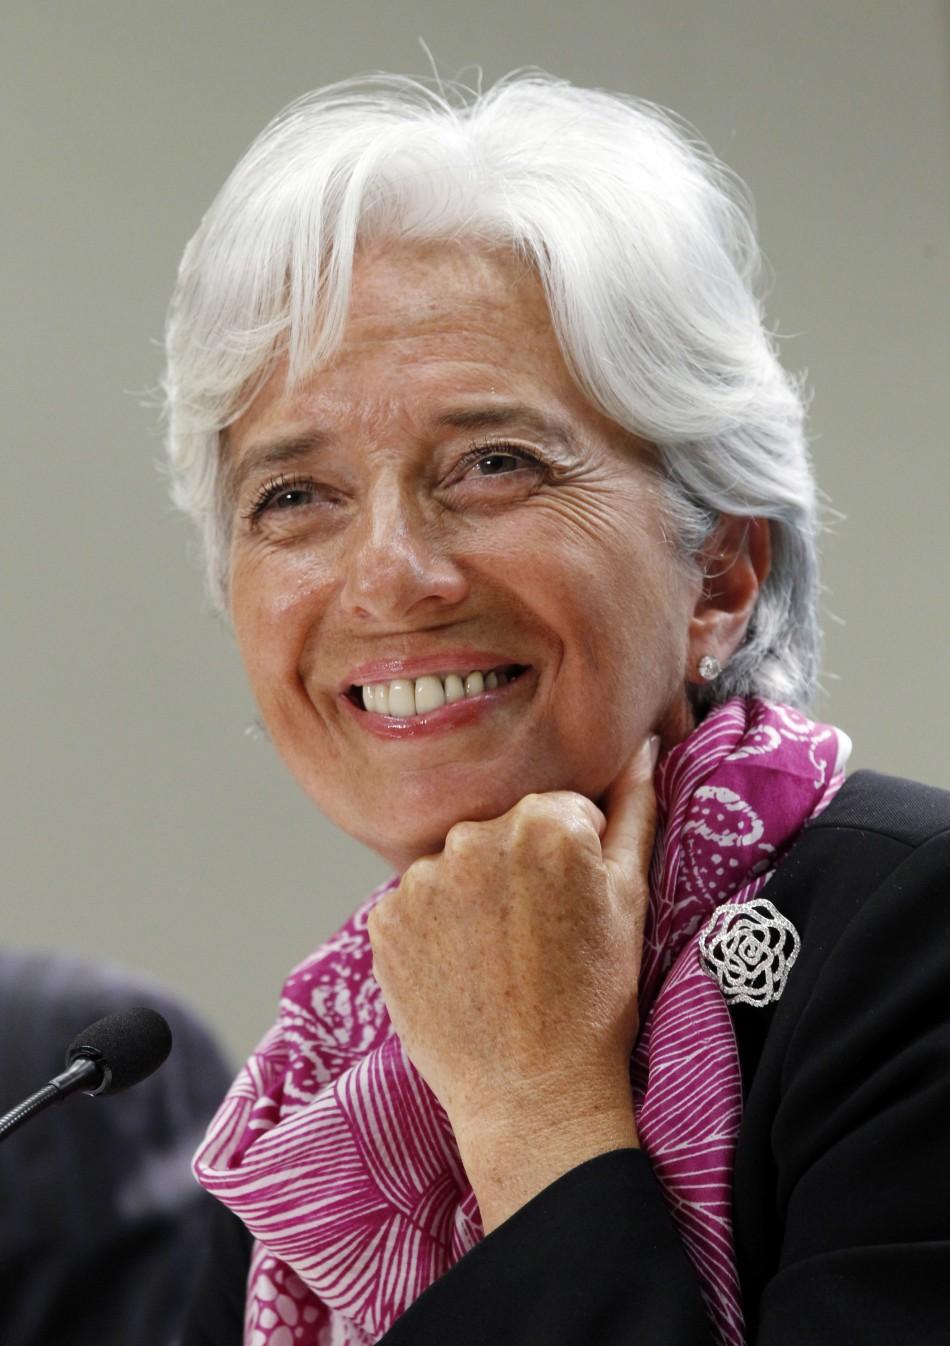 9.Christine Lagarde: IMF Managing Director